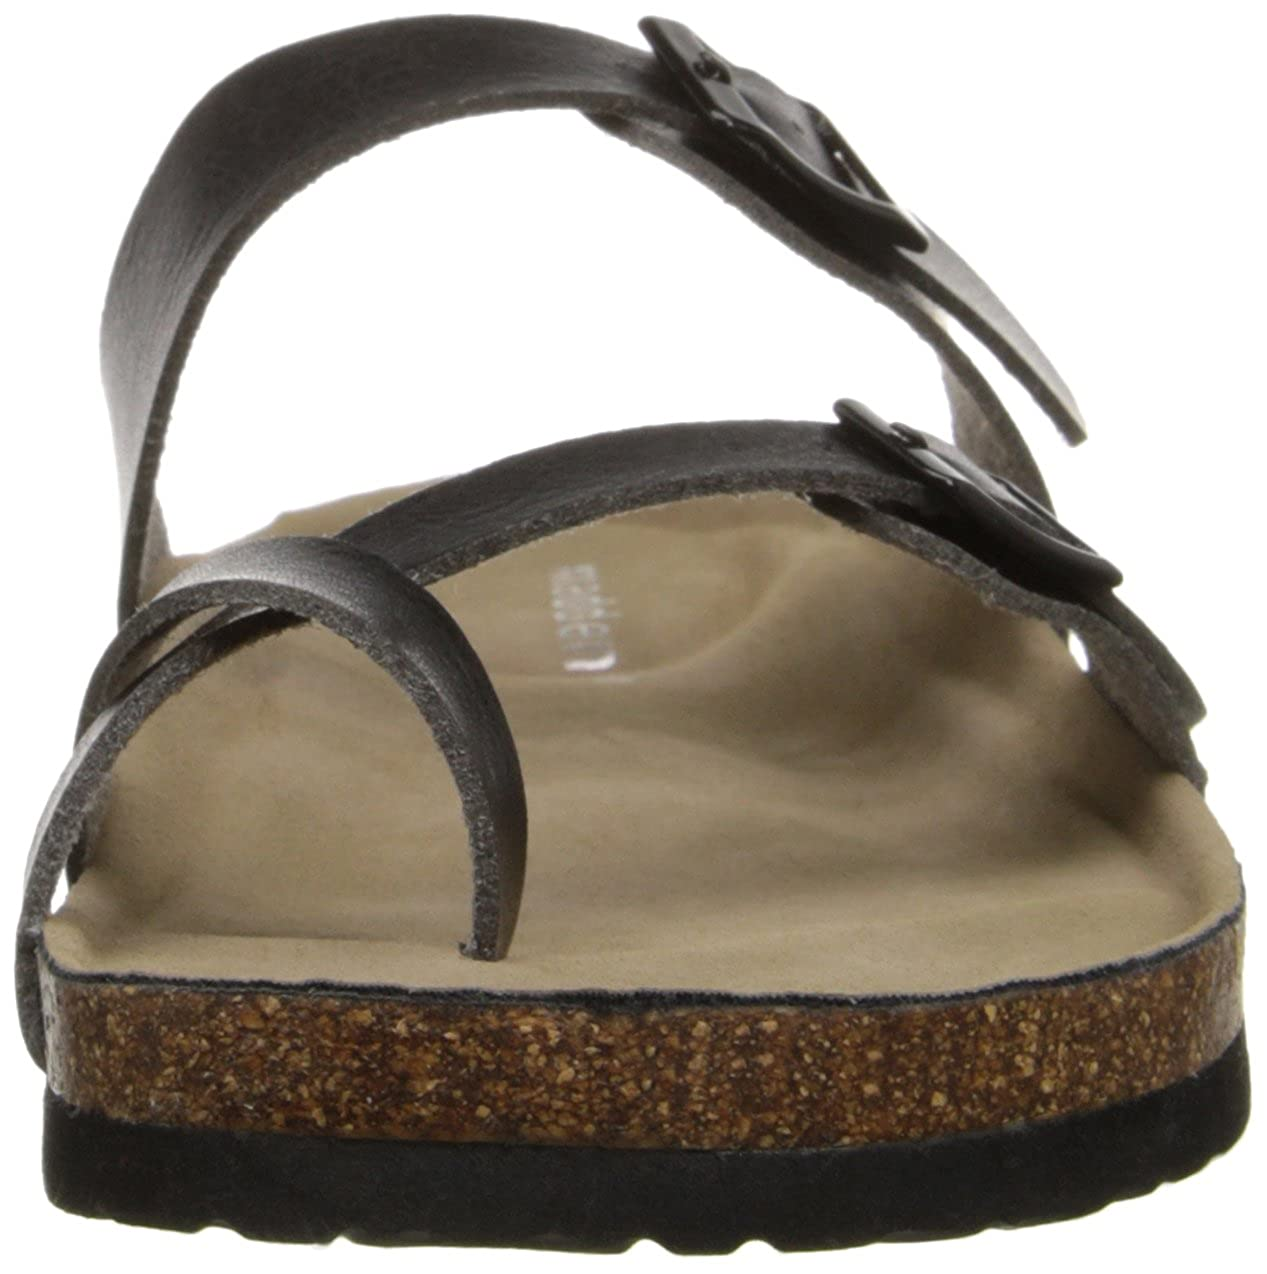 90f6a6aa264 Madden Girl Women's Bryceee Toe Ring Sandal